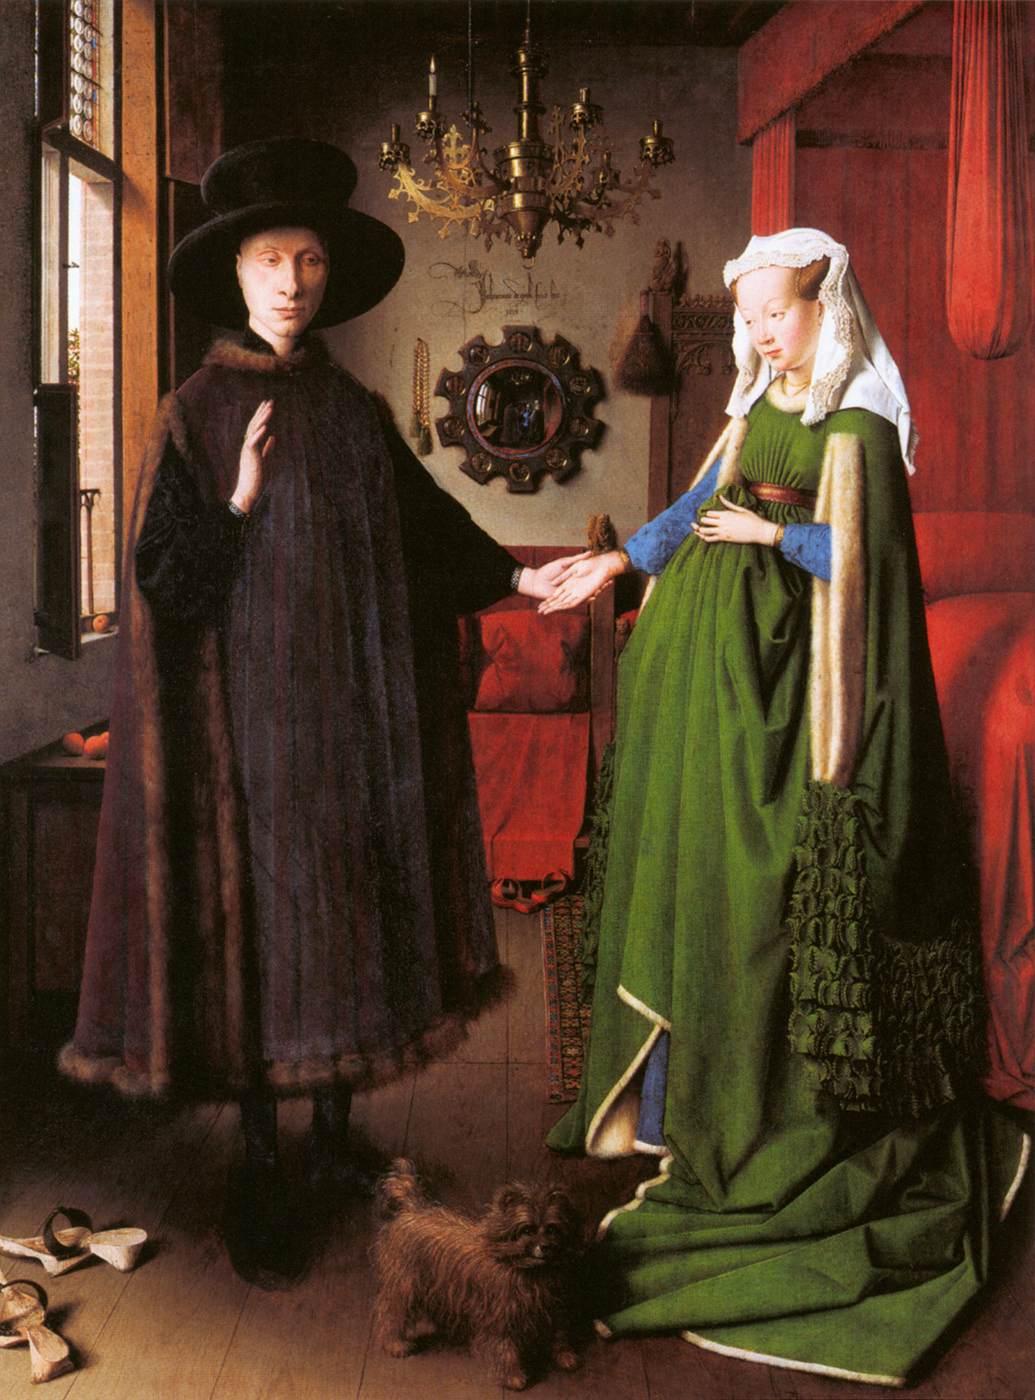 SharedFuture - NIMMA - Mixed Emotions - 11 Medieval Wedding